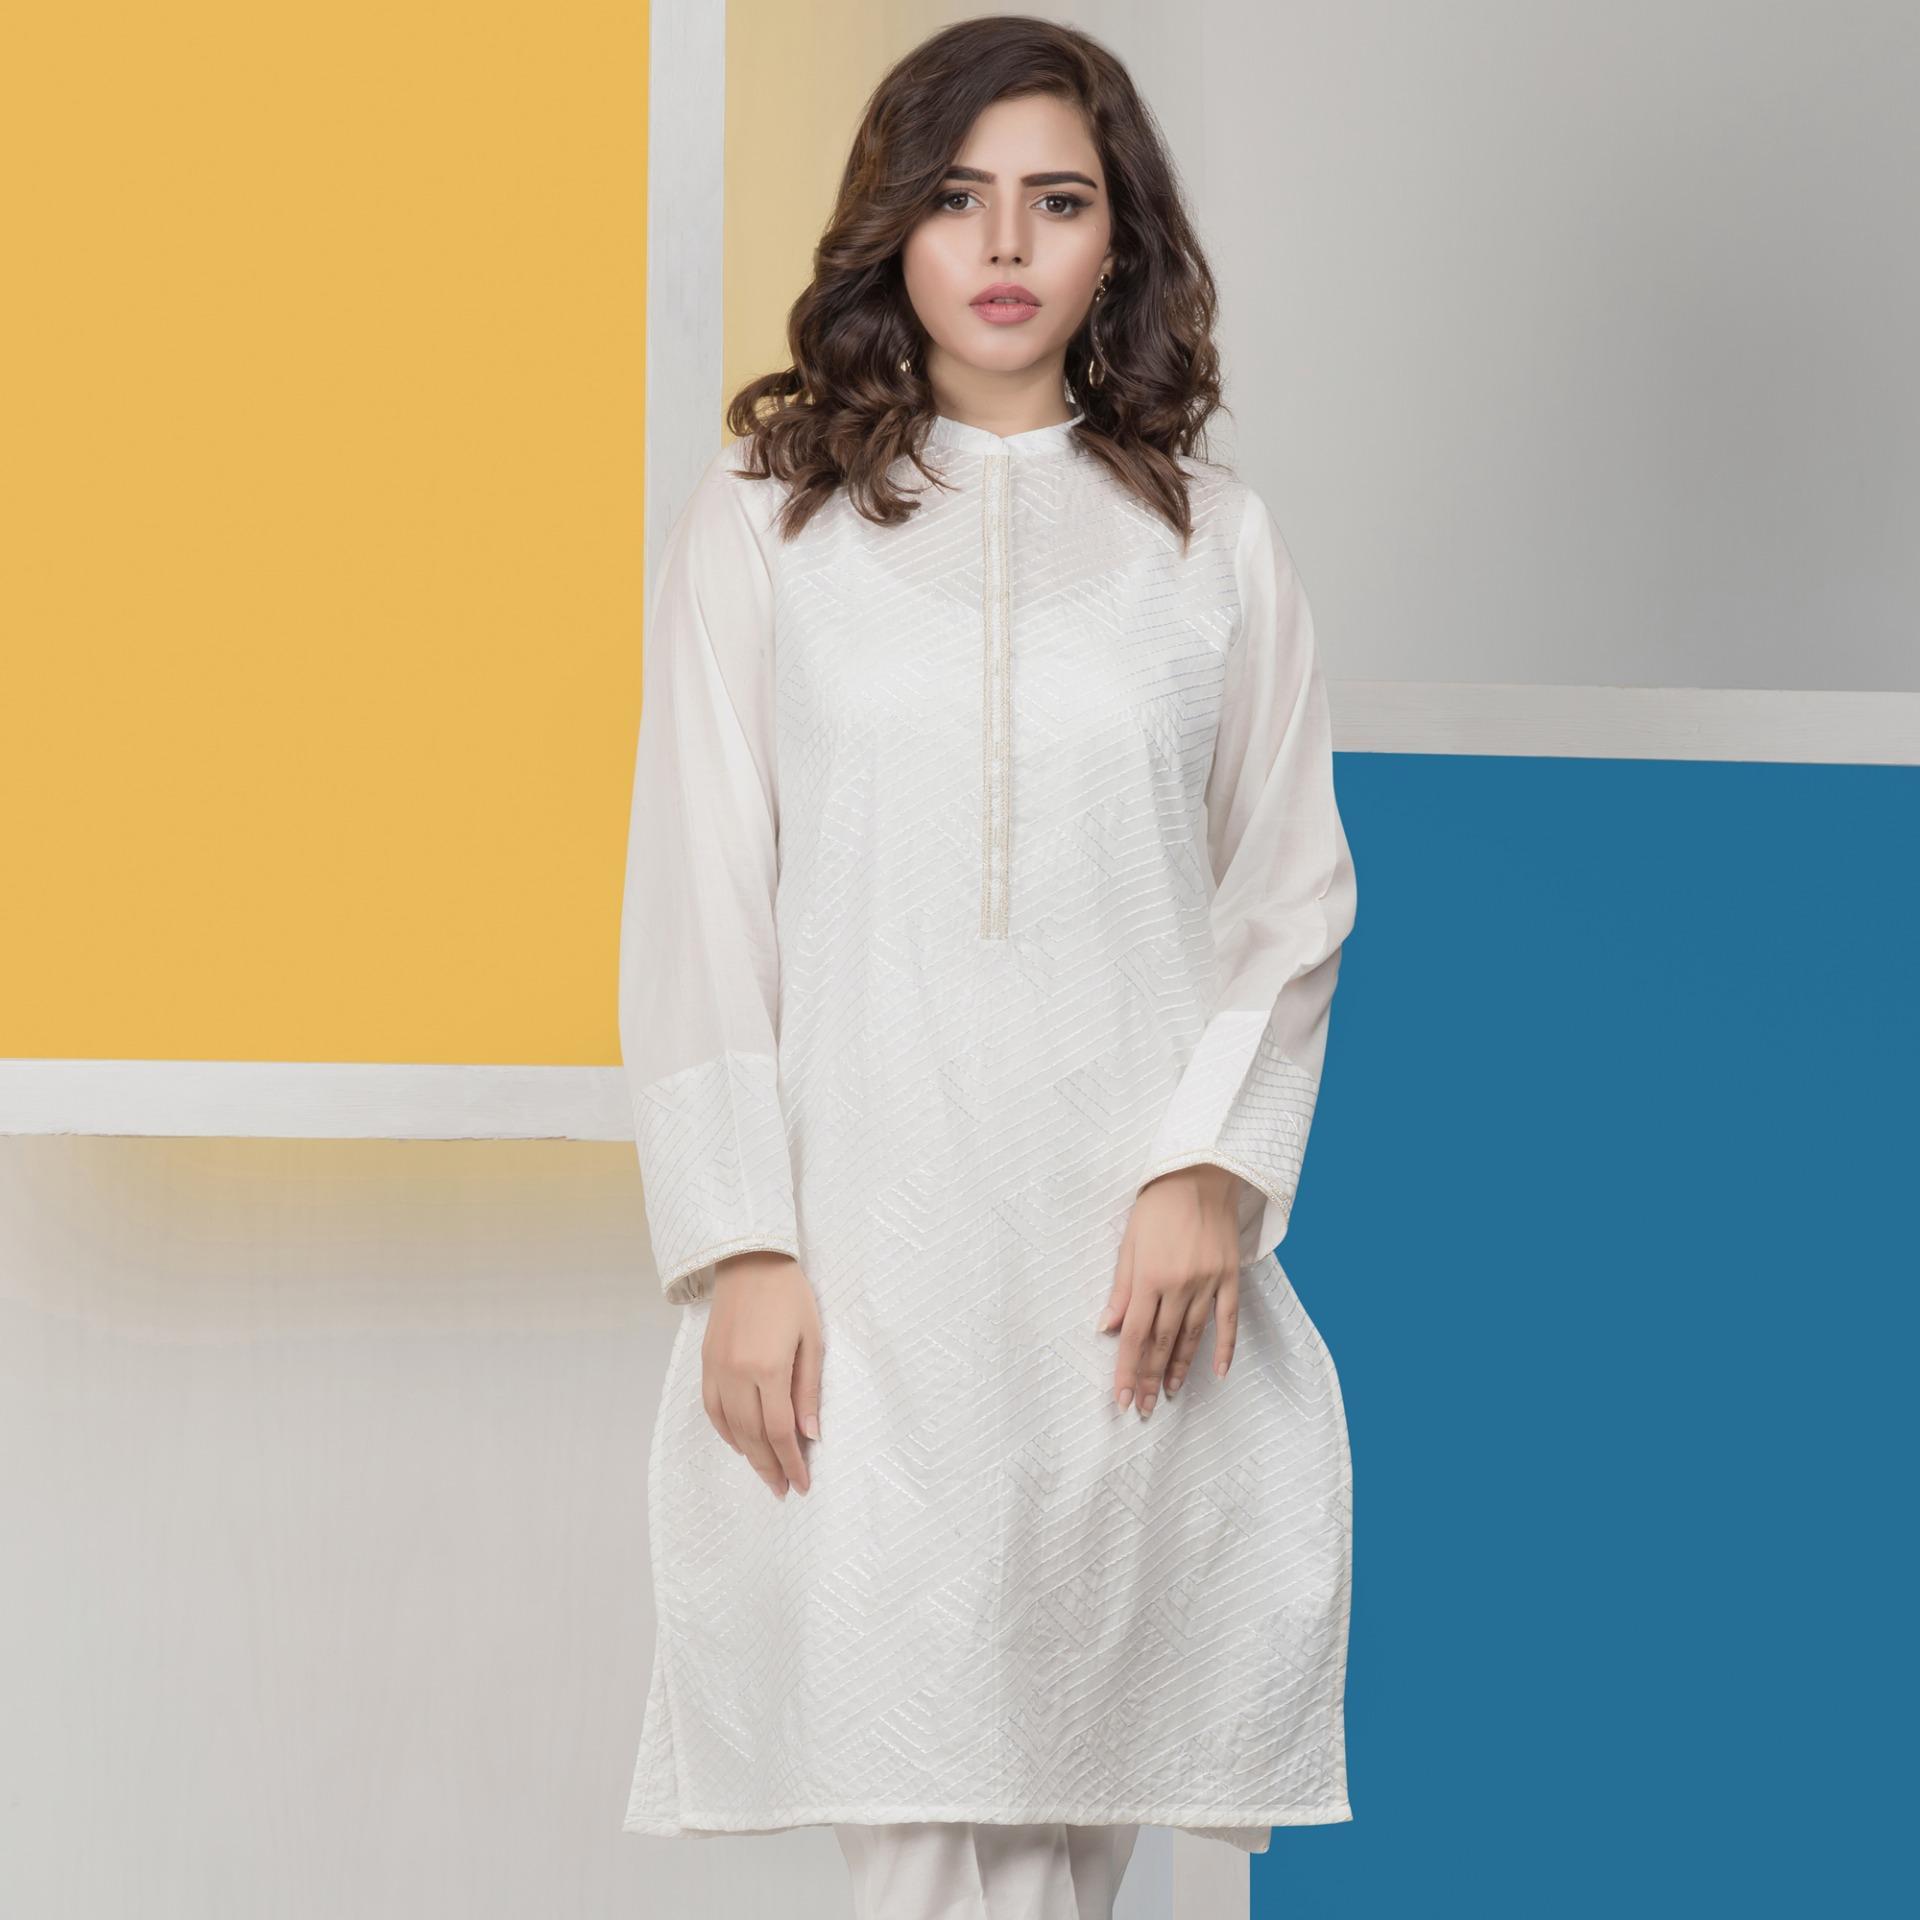 """Lsm Fabrics Gulkari Collection Rtw White Cambric Kurti For Women"""